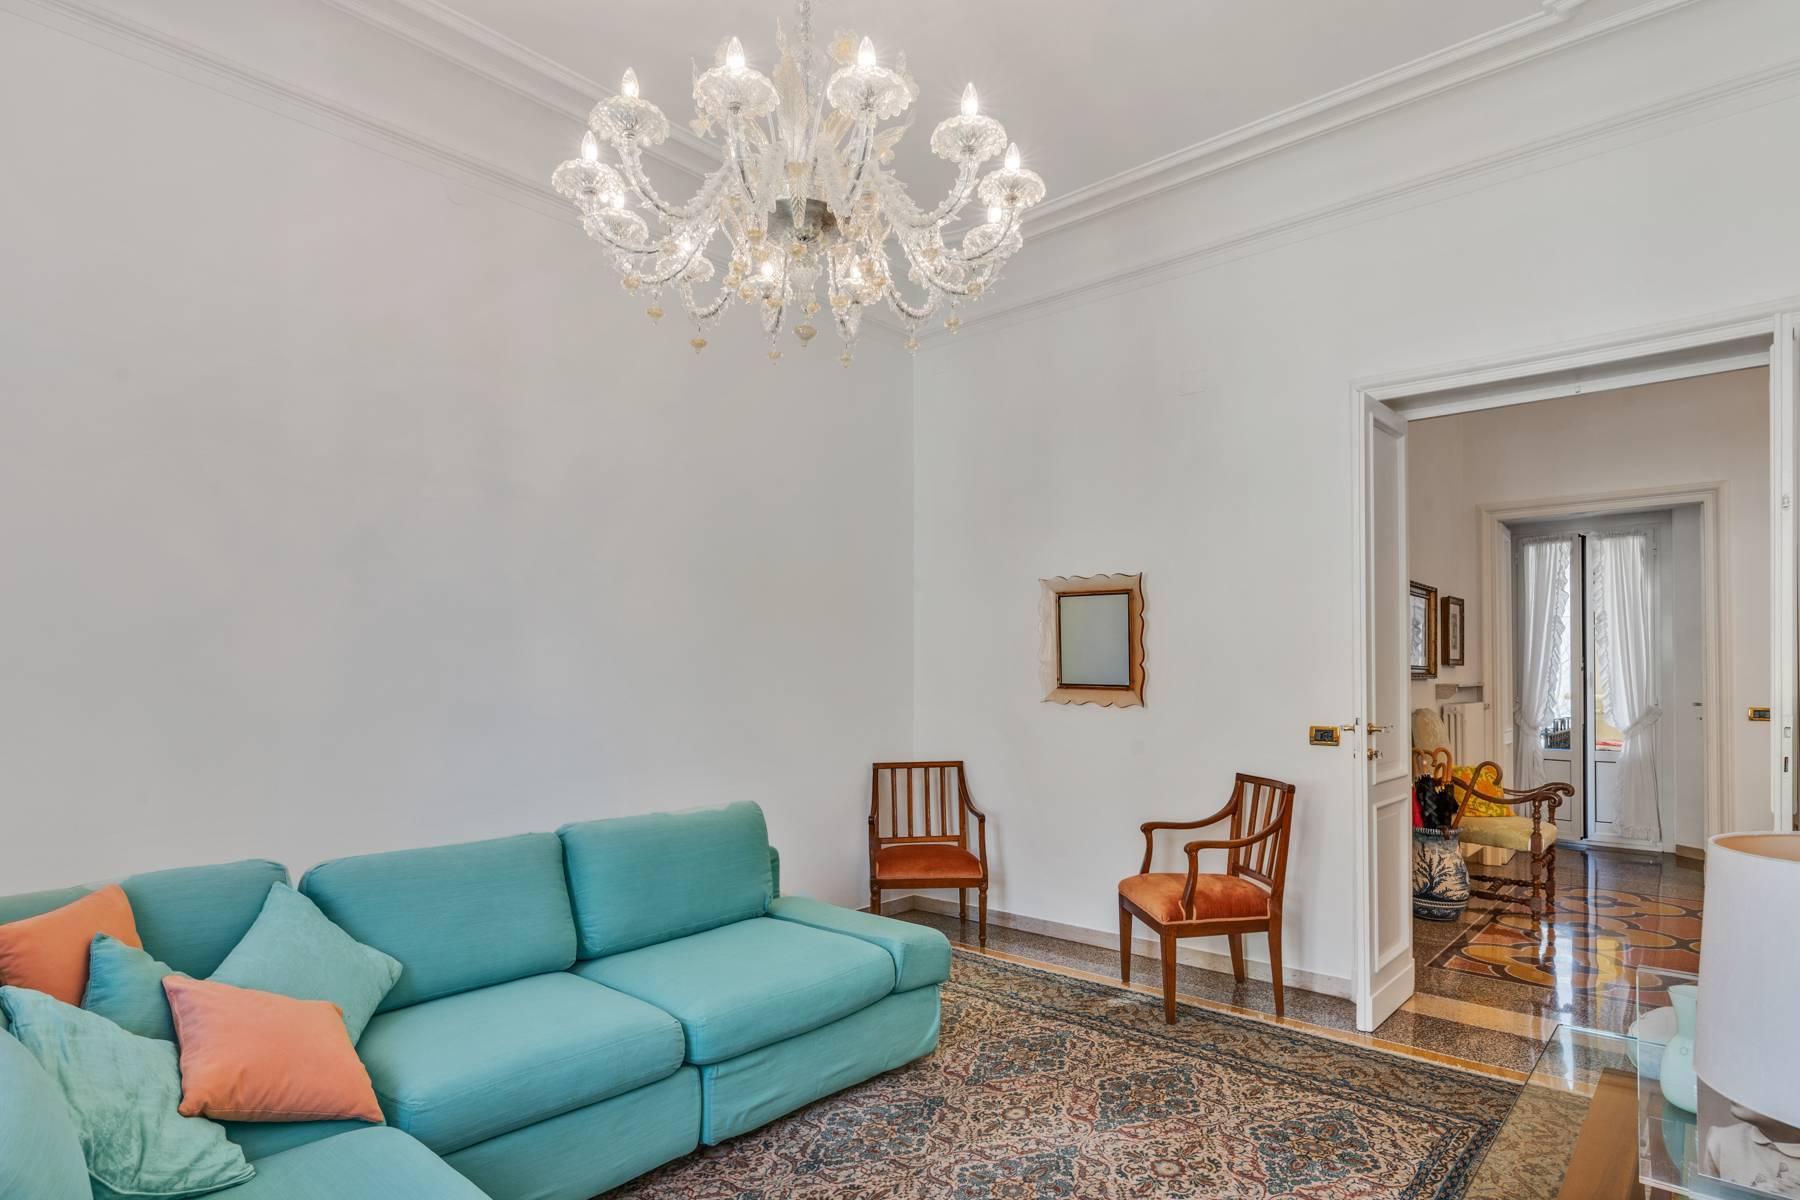 Prestigious 275 sqm apartment inside a period building in Carignano - 10